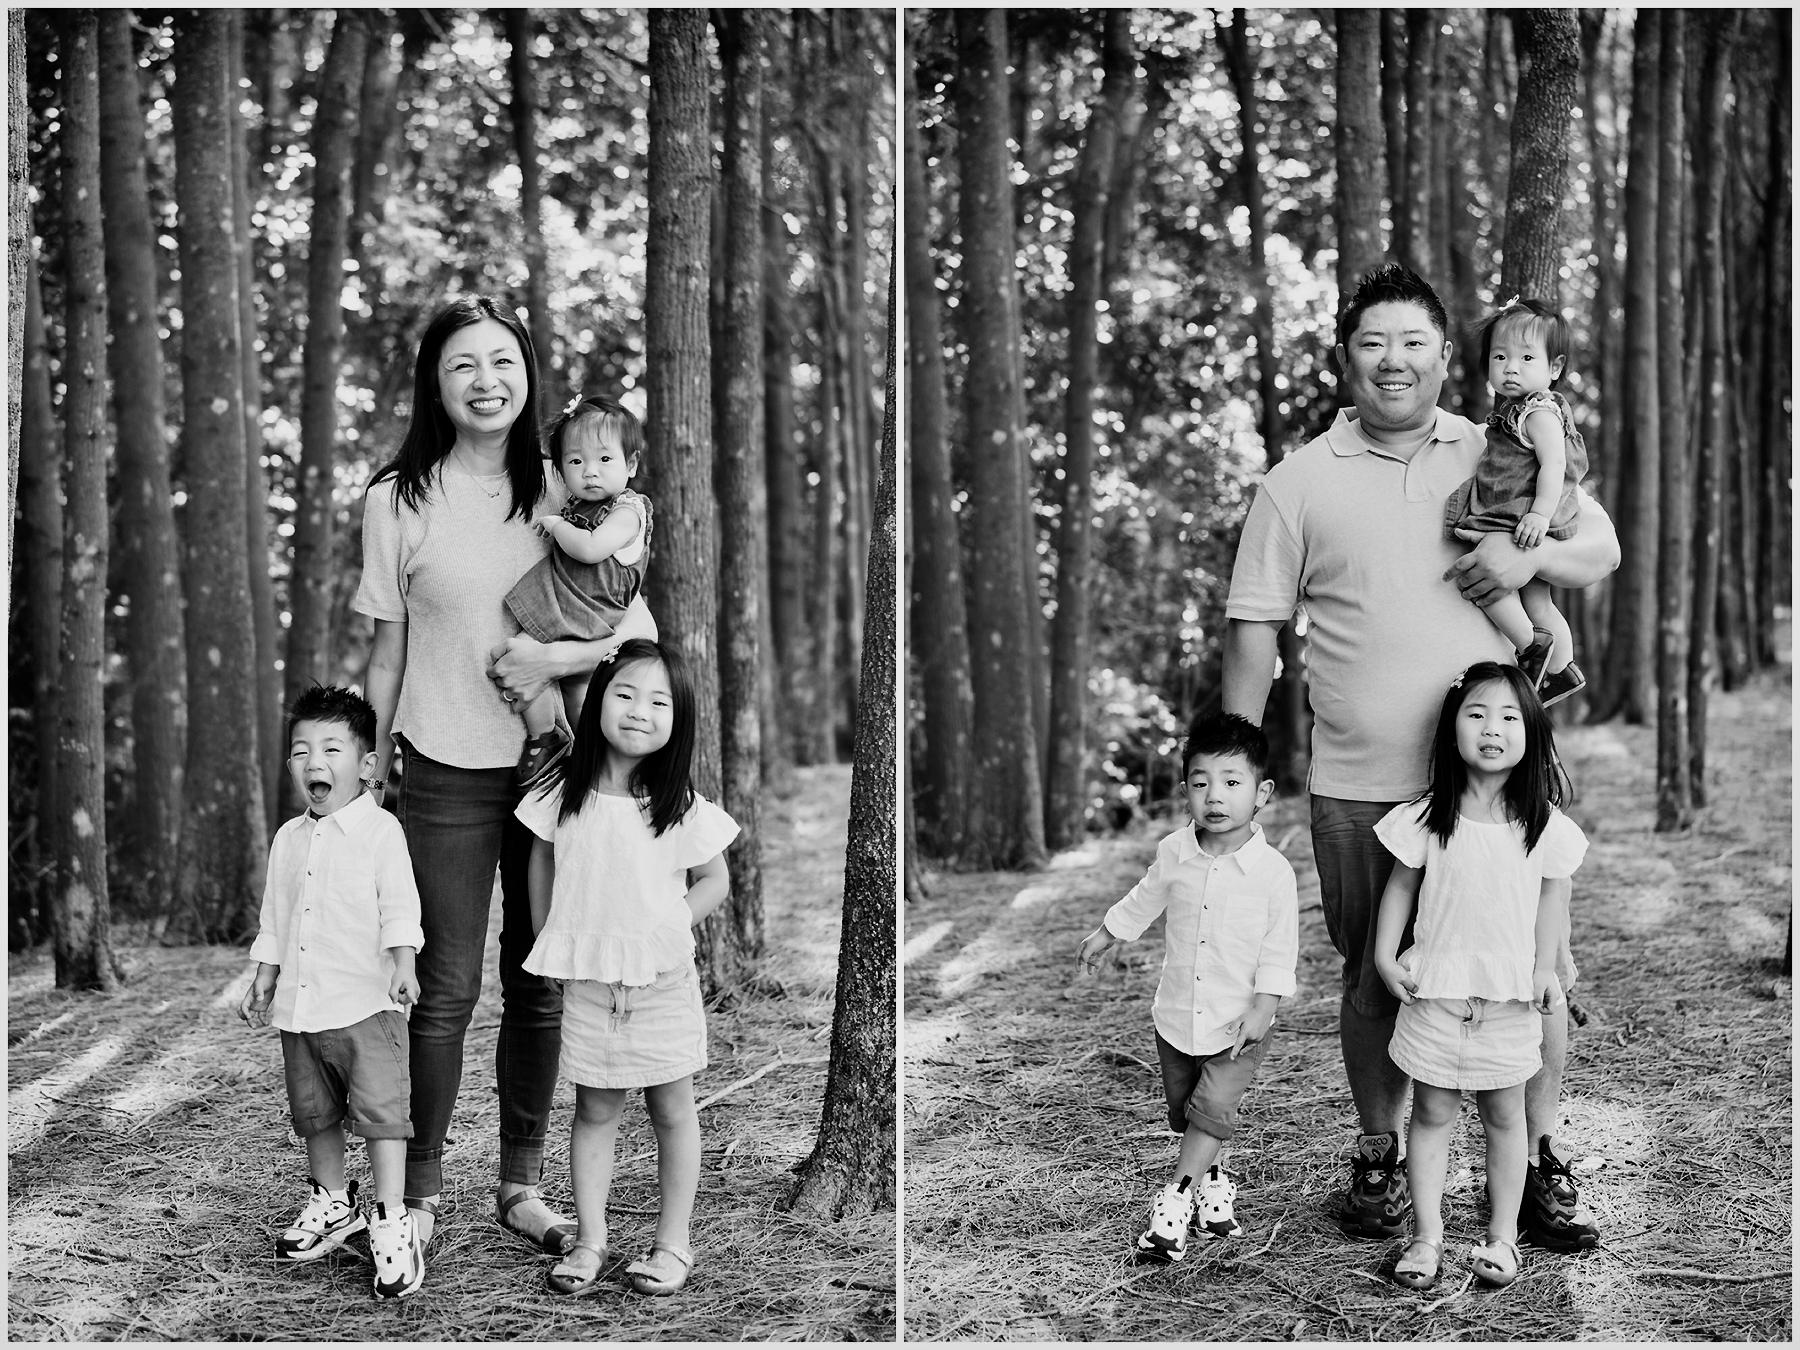 Christmas Family Mini Photo Sessions